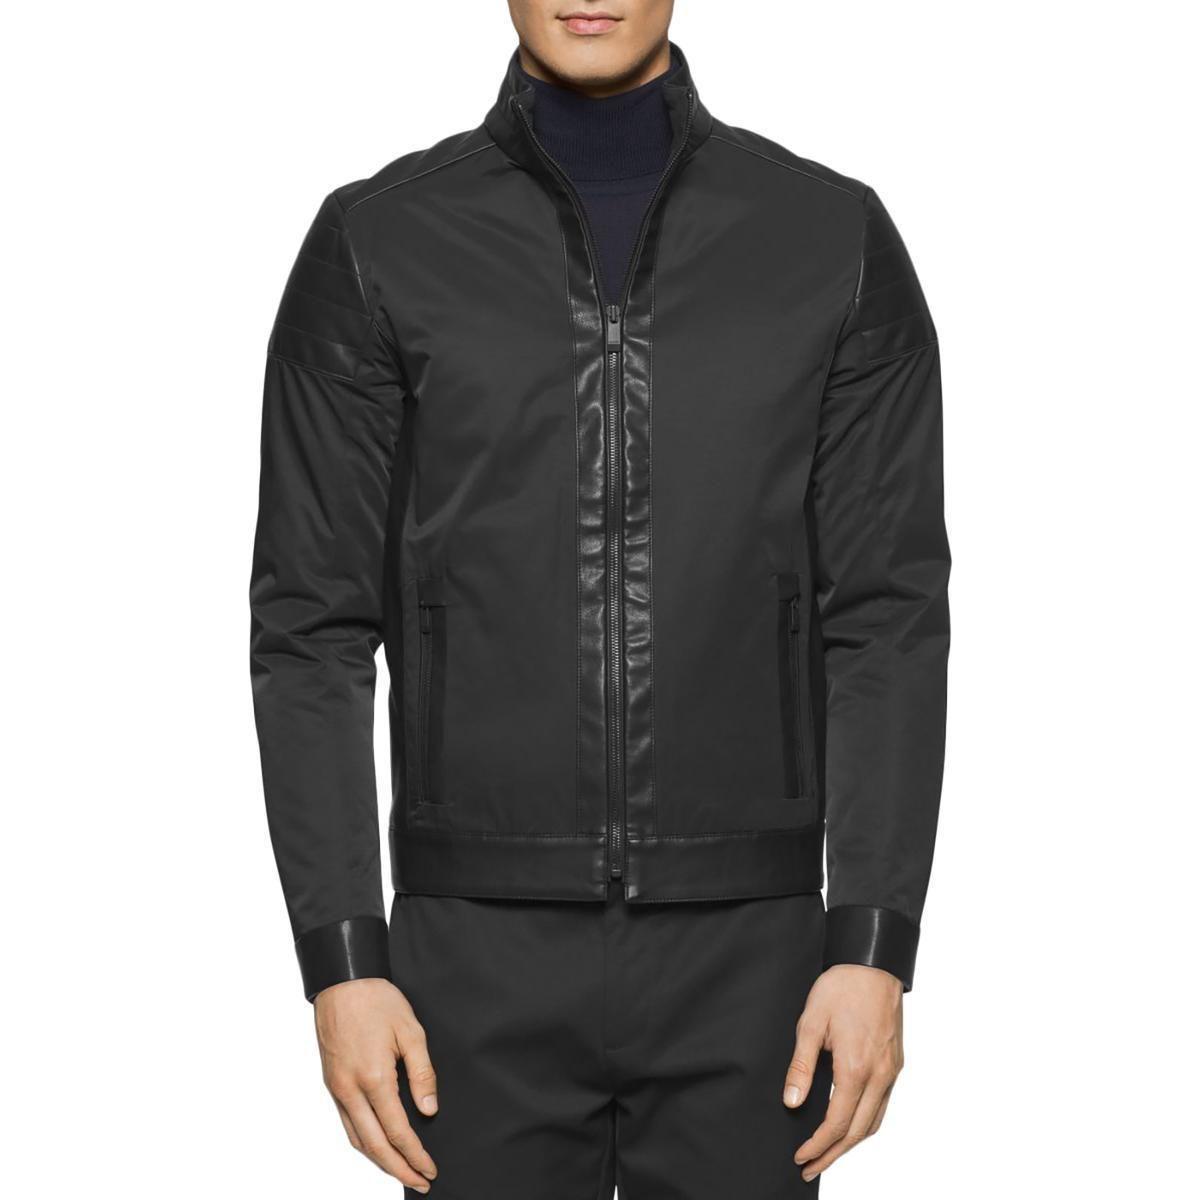 118 80 Calvin Klein Mens Black Winter Warm Casual Bomber Jacket Outerwear L Bhfo 8434 Calvin Klein Me Outerwear Jackets Casual Bomber Athletic Jacket [ 1200 x 1200 Pixel ]